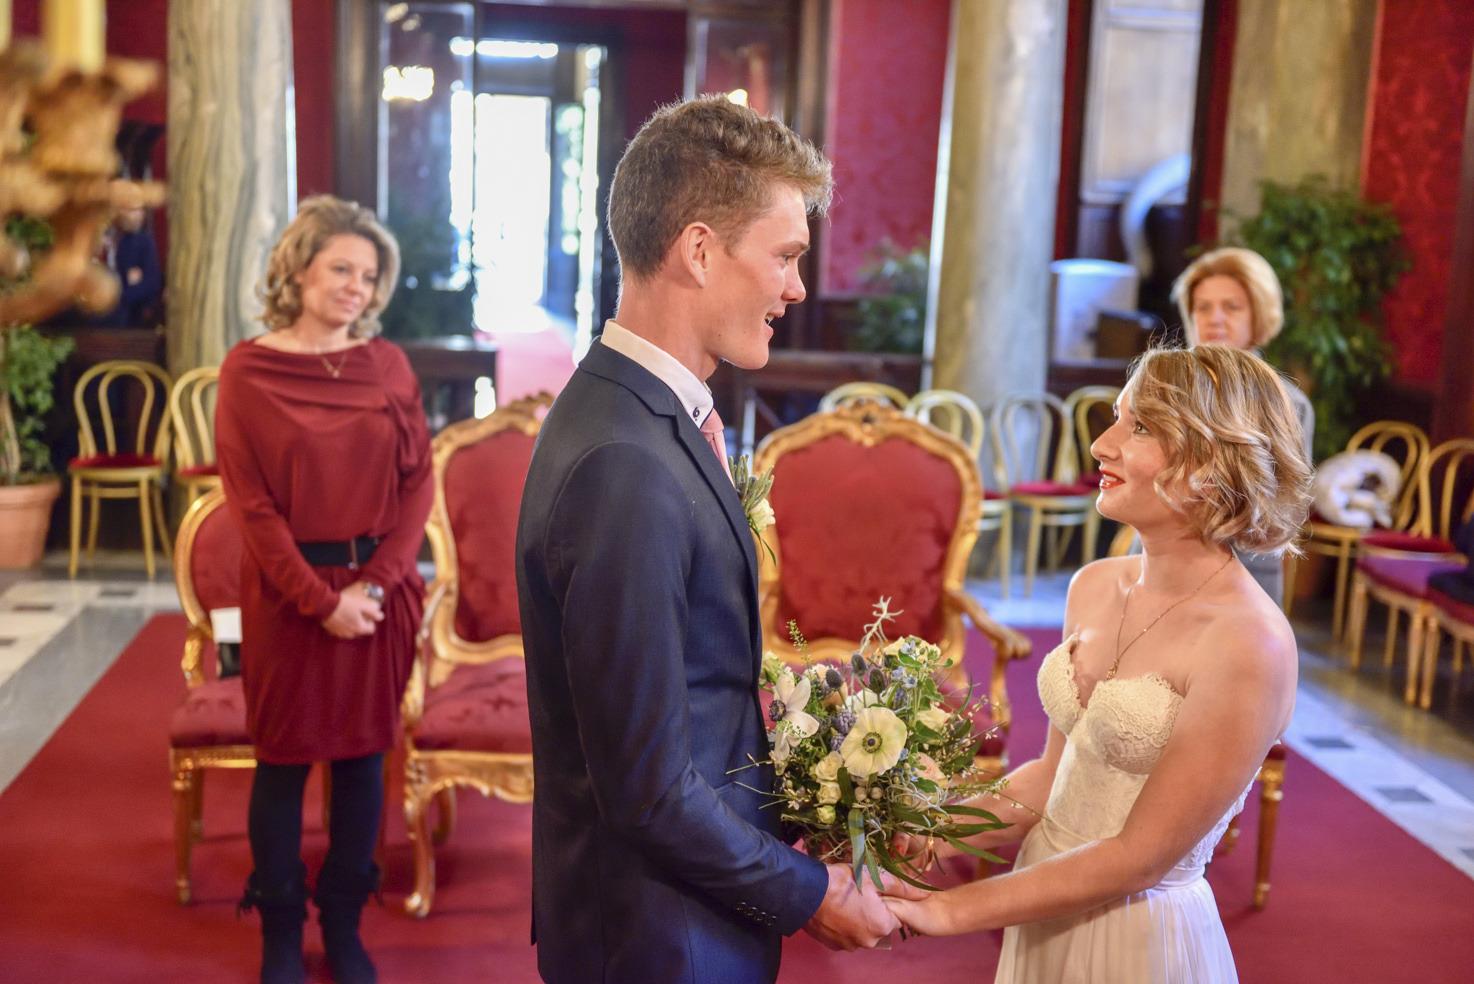 Rome civil wedding at Campidoglio